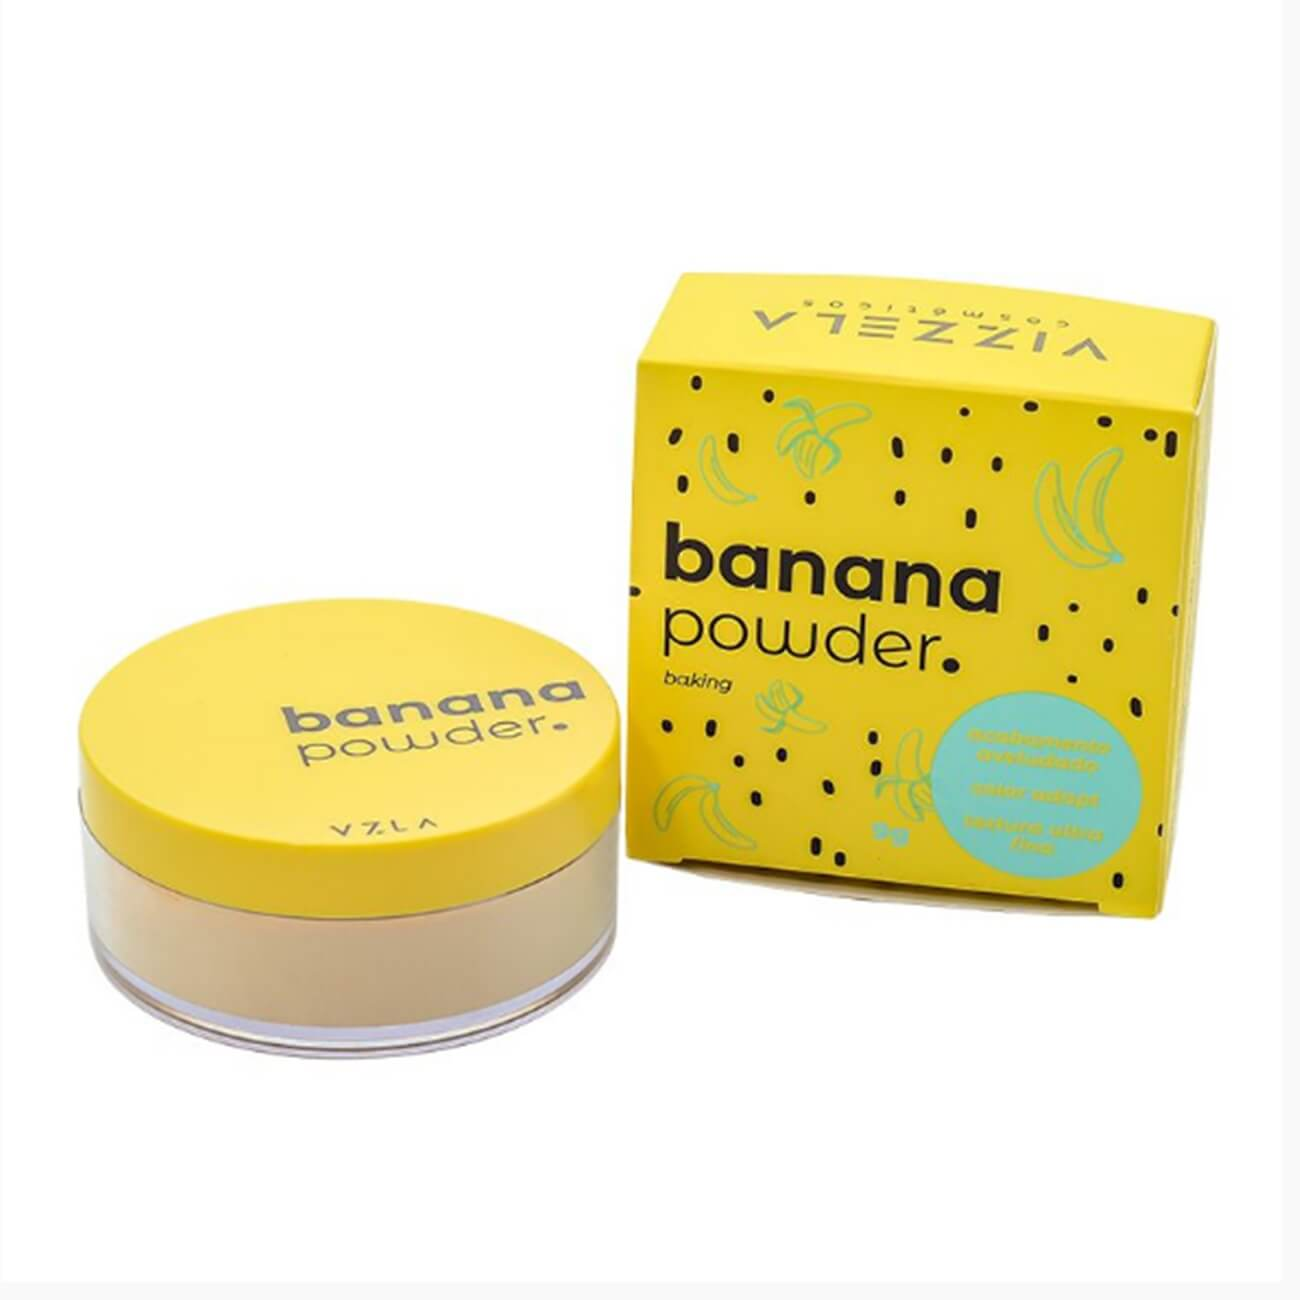 Banana Powder 9g - Vizzela Cosméticos